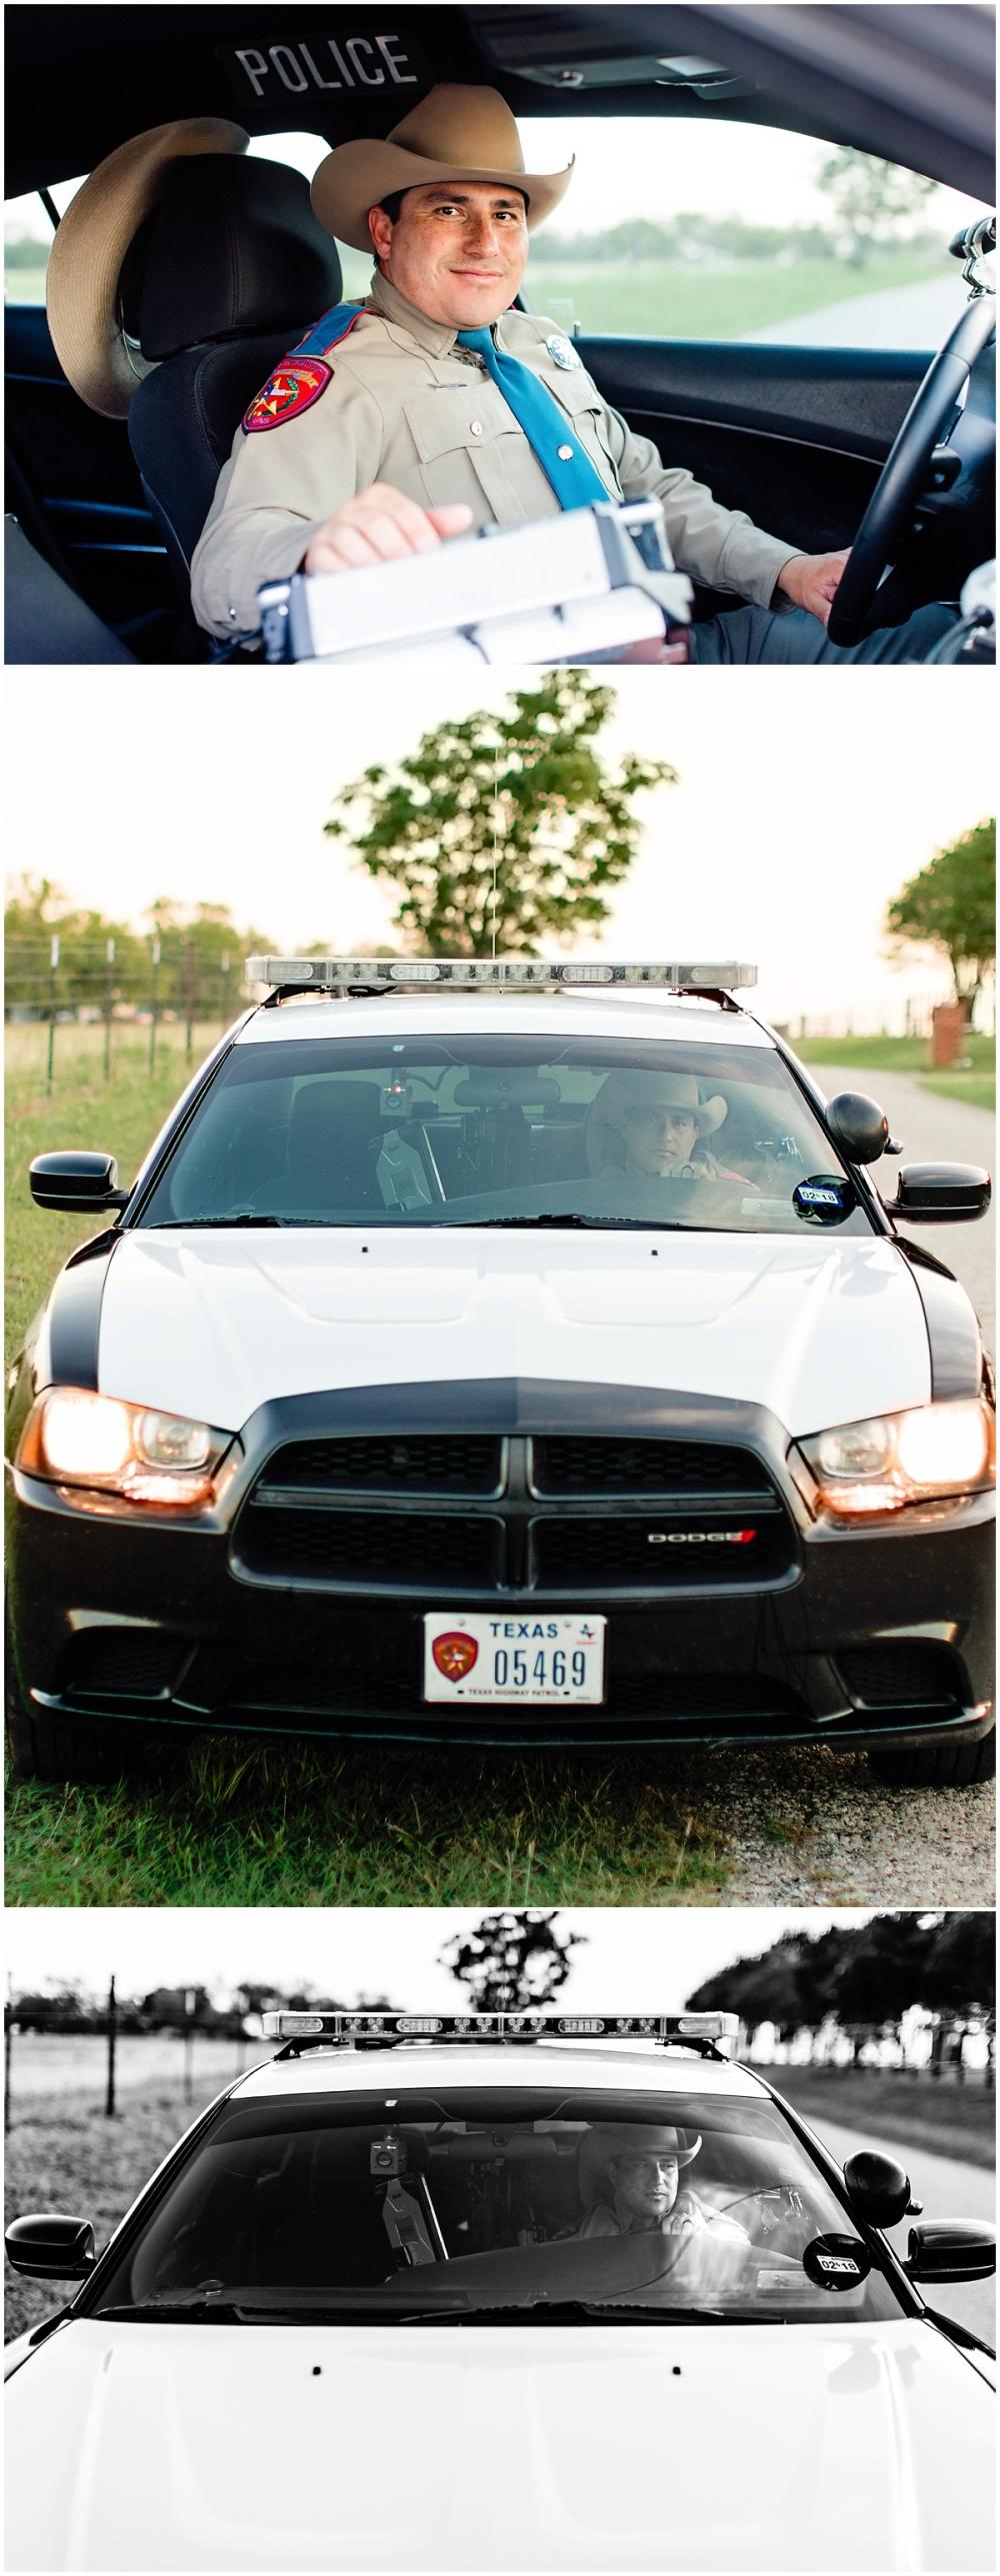 Portraits-State-Trooper-Photos-San-Antonio-Hill-Country-Texas-Carly-Barton-Photography_0005.jpg